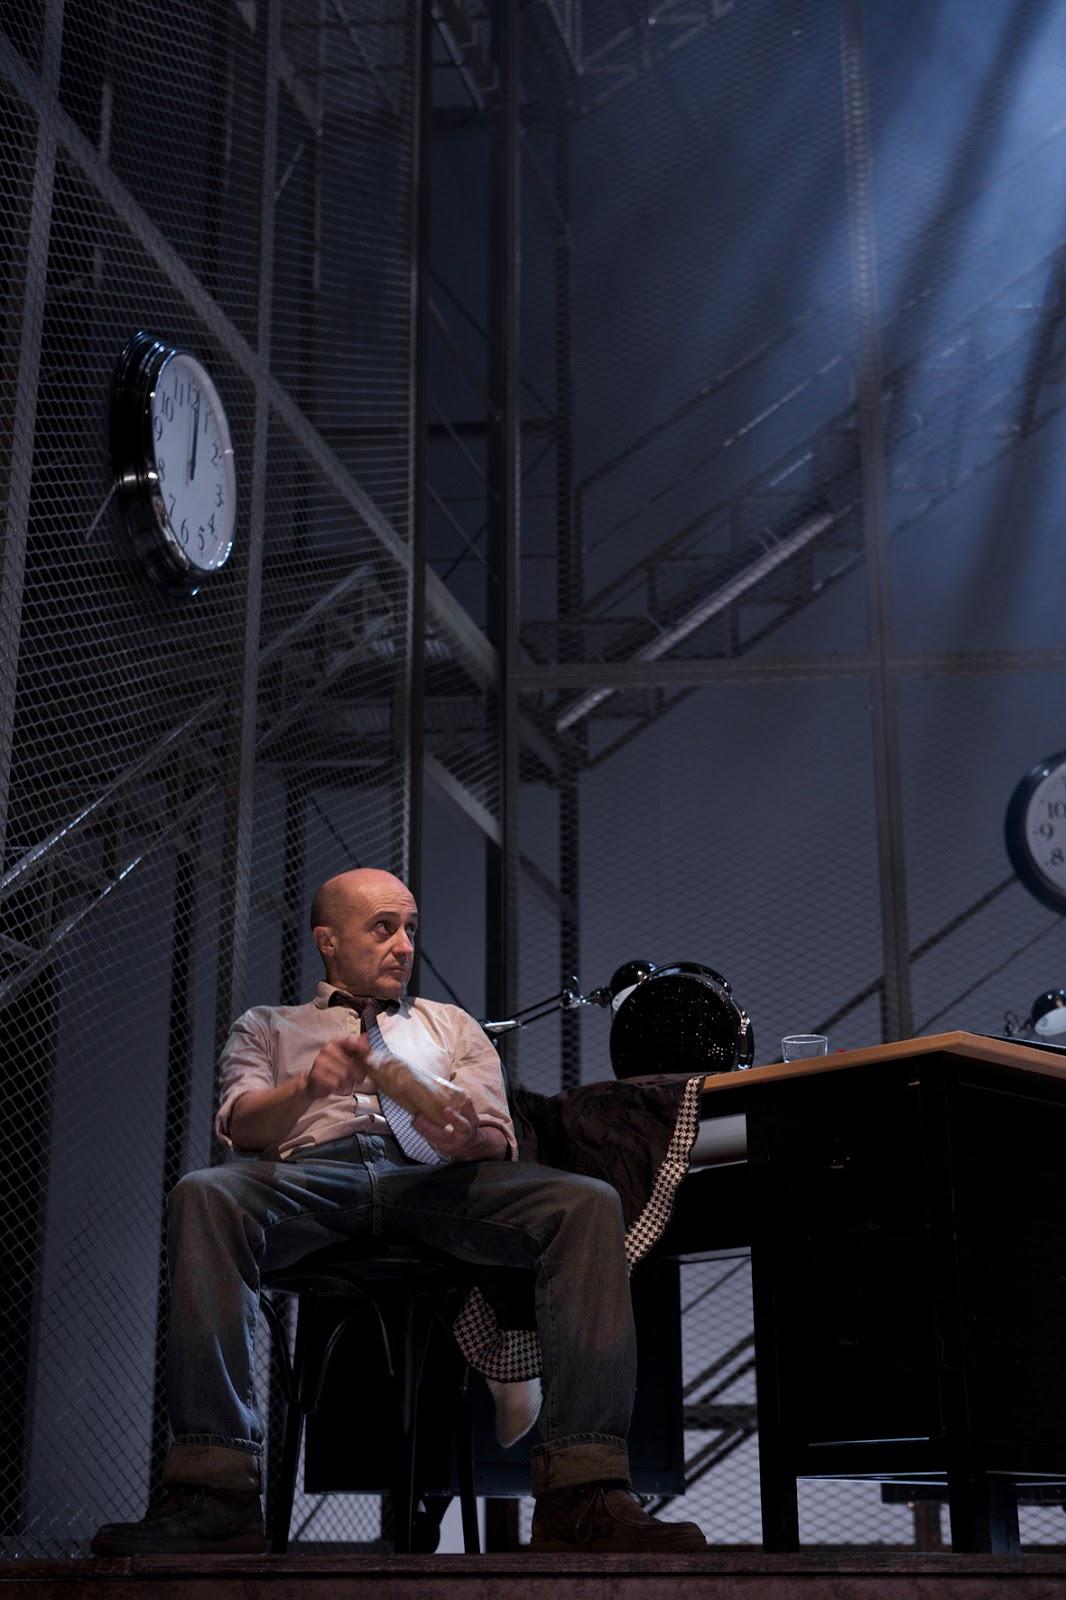 Pepe Viyuela como Berenger en Rinoceronte - Fotografía de Valentín Álvarez